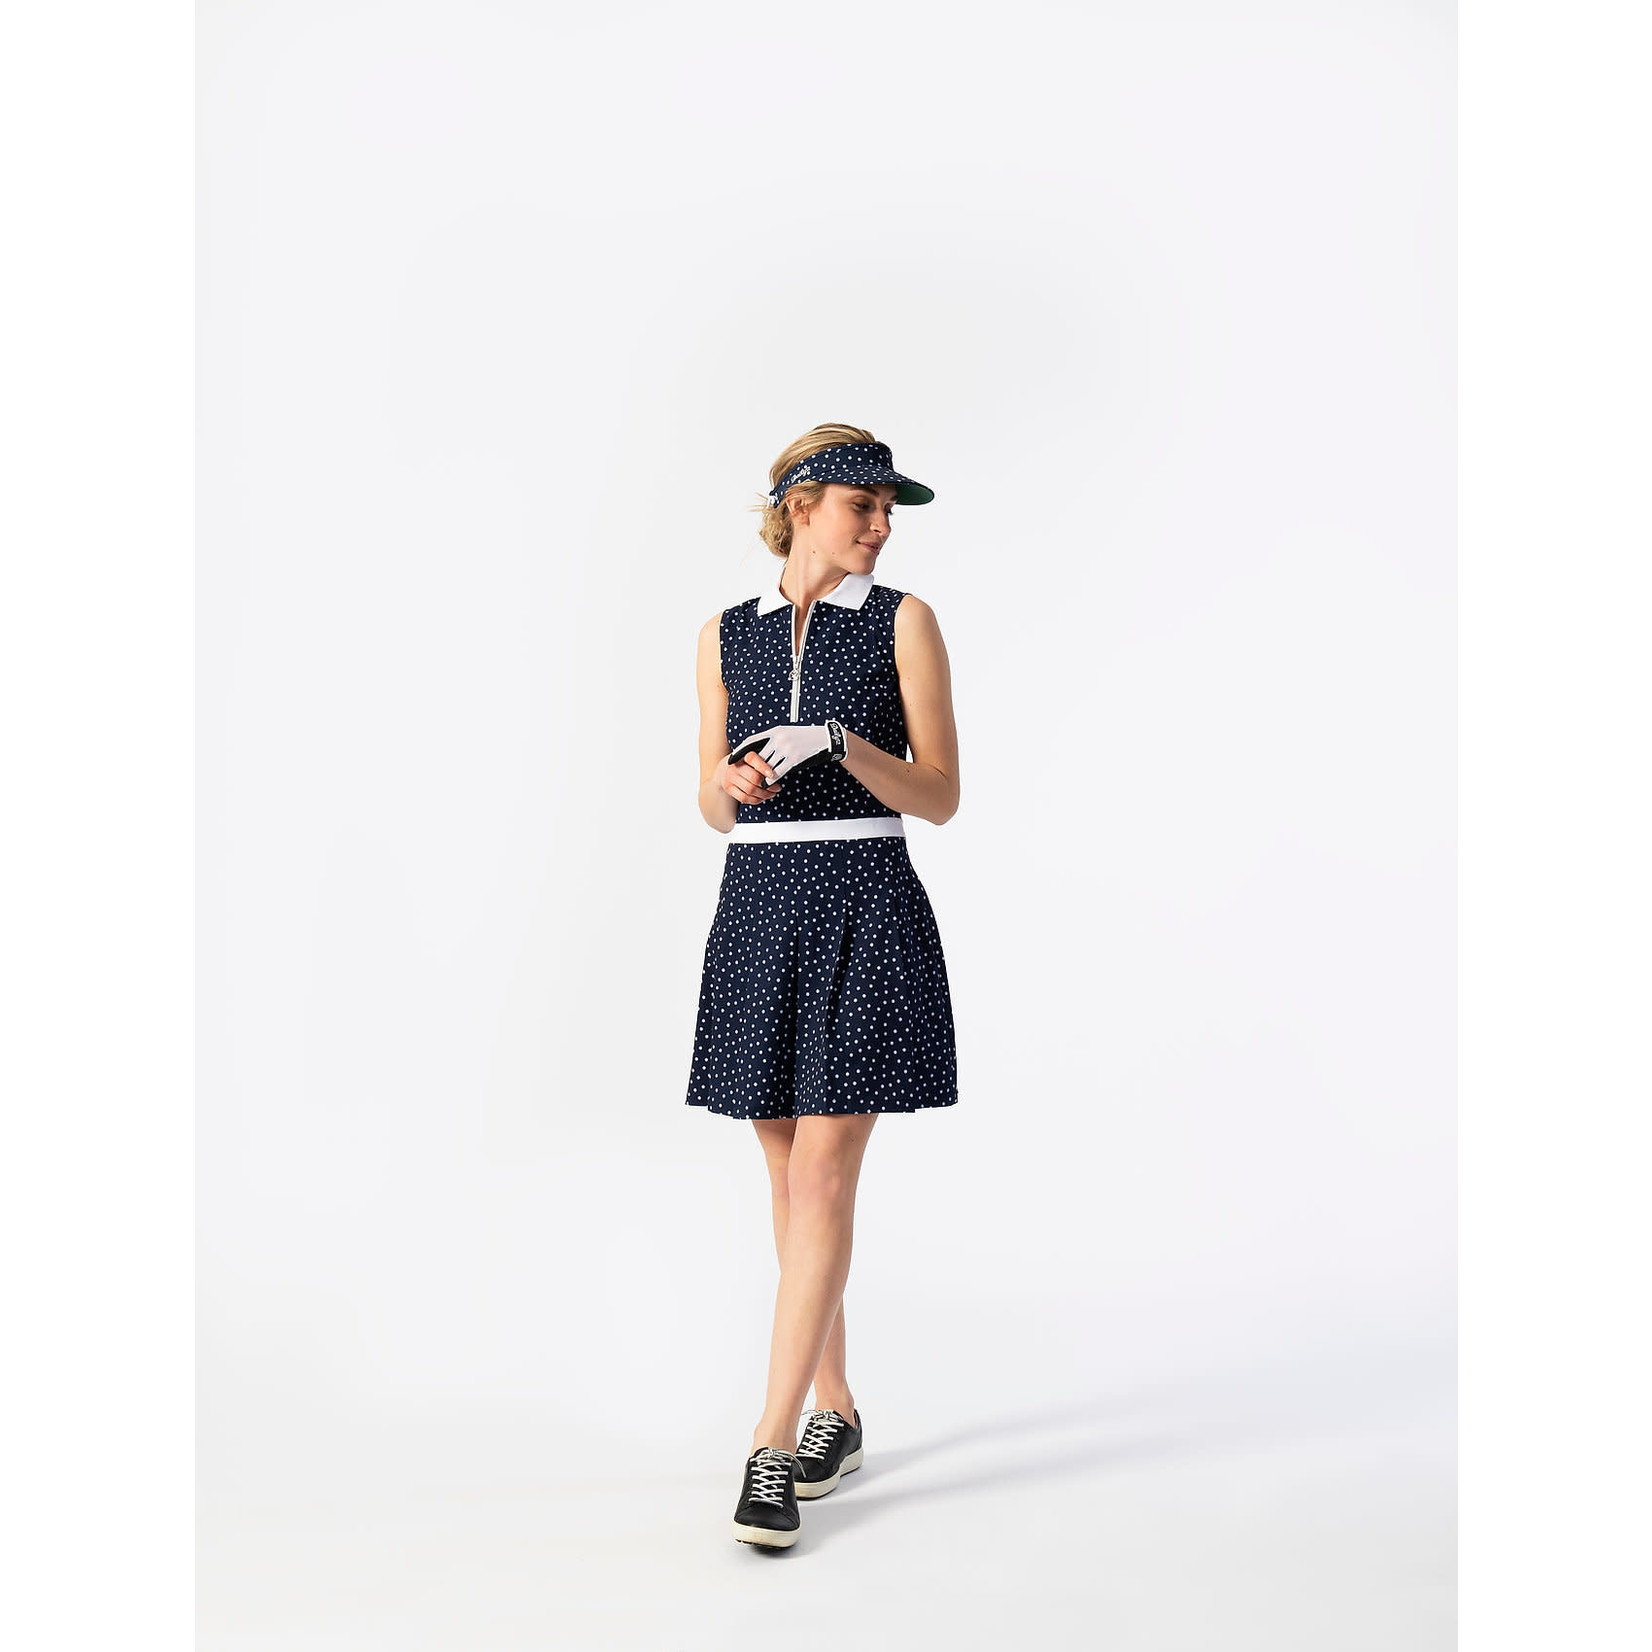 Daily Sports Daily Eileen Dress XL